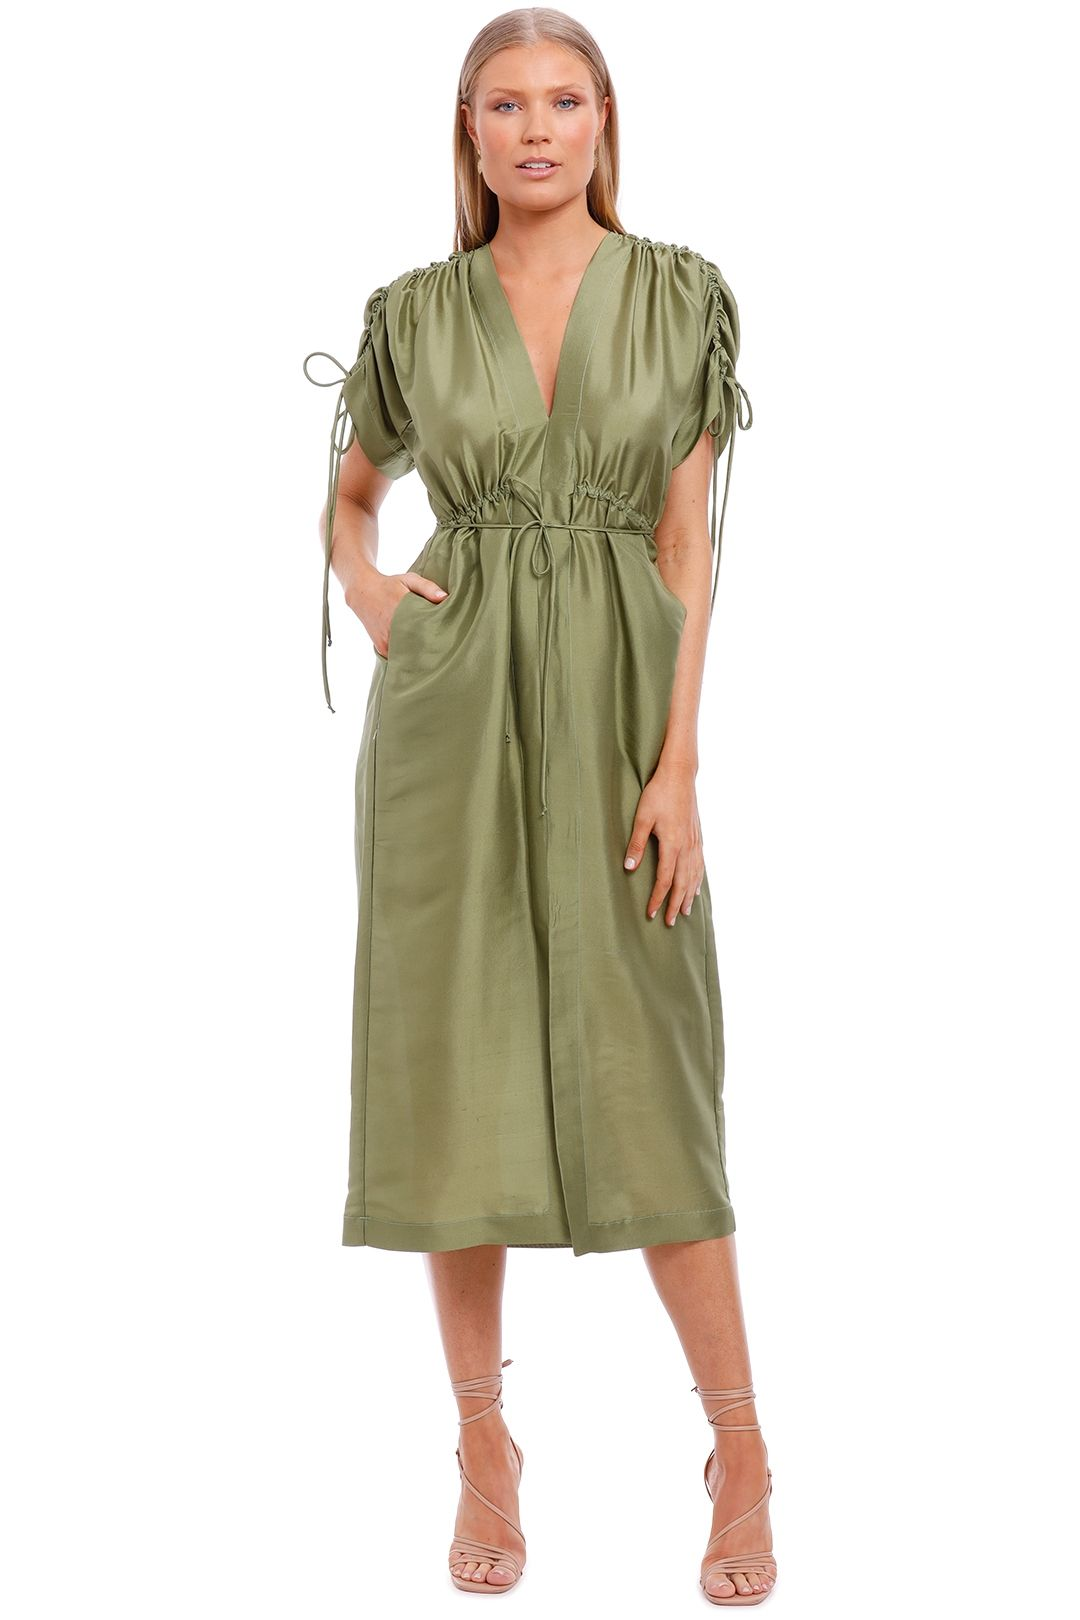 KITX Crush Dress Moss Green